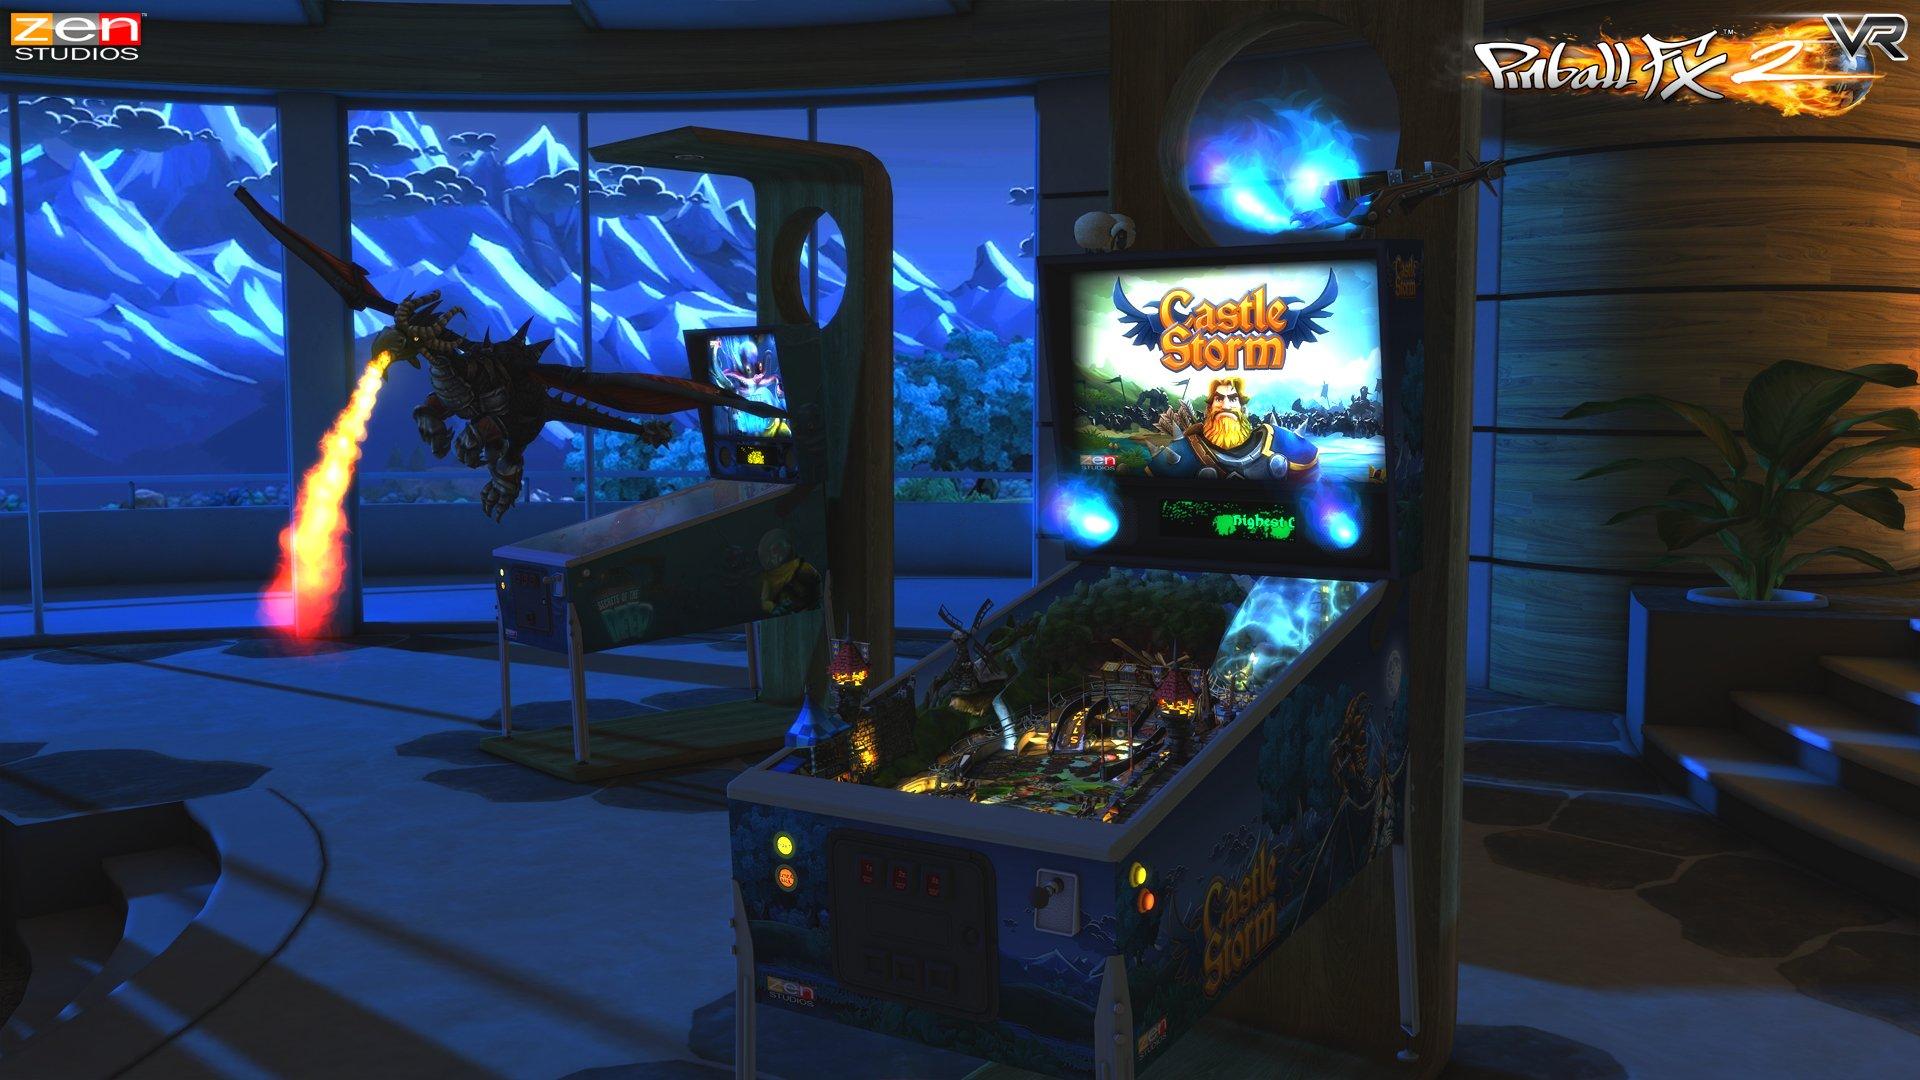 Pinball_FX2_VR_gear_vr_screenshot_CastleStorm